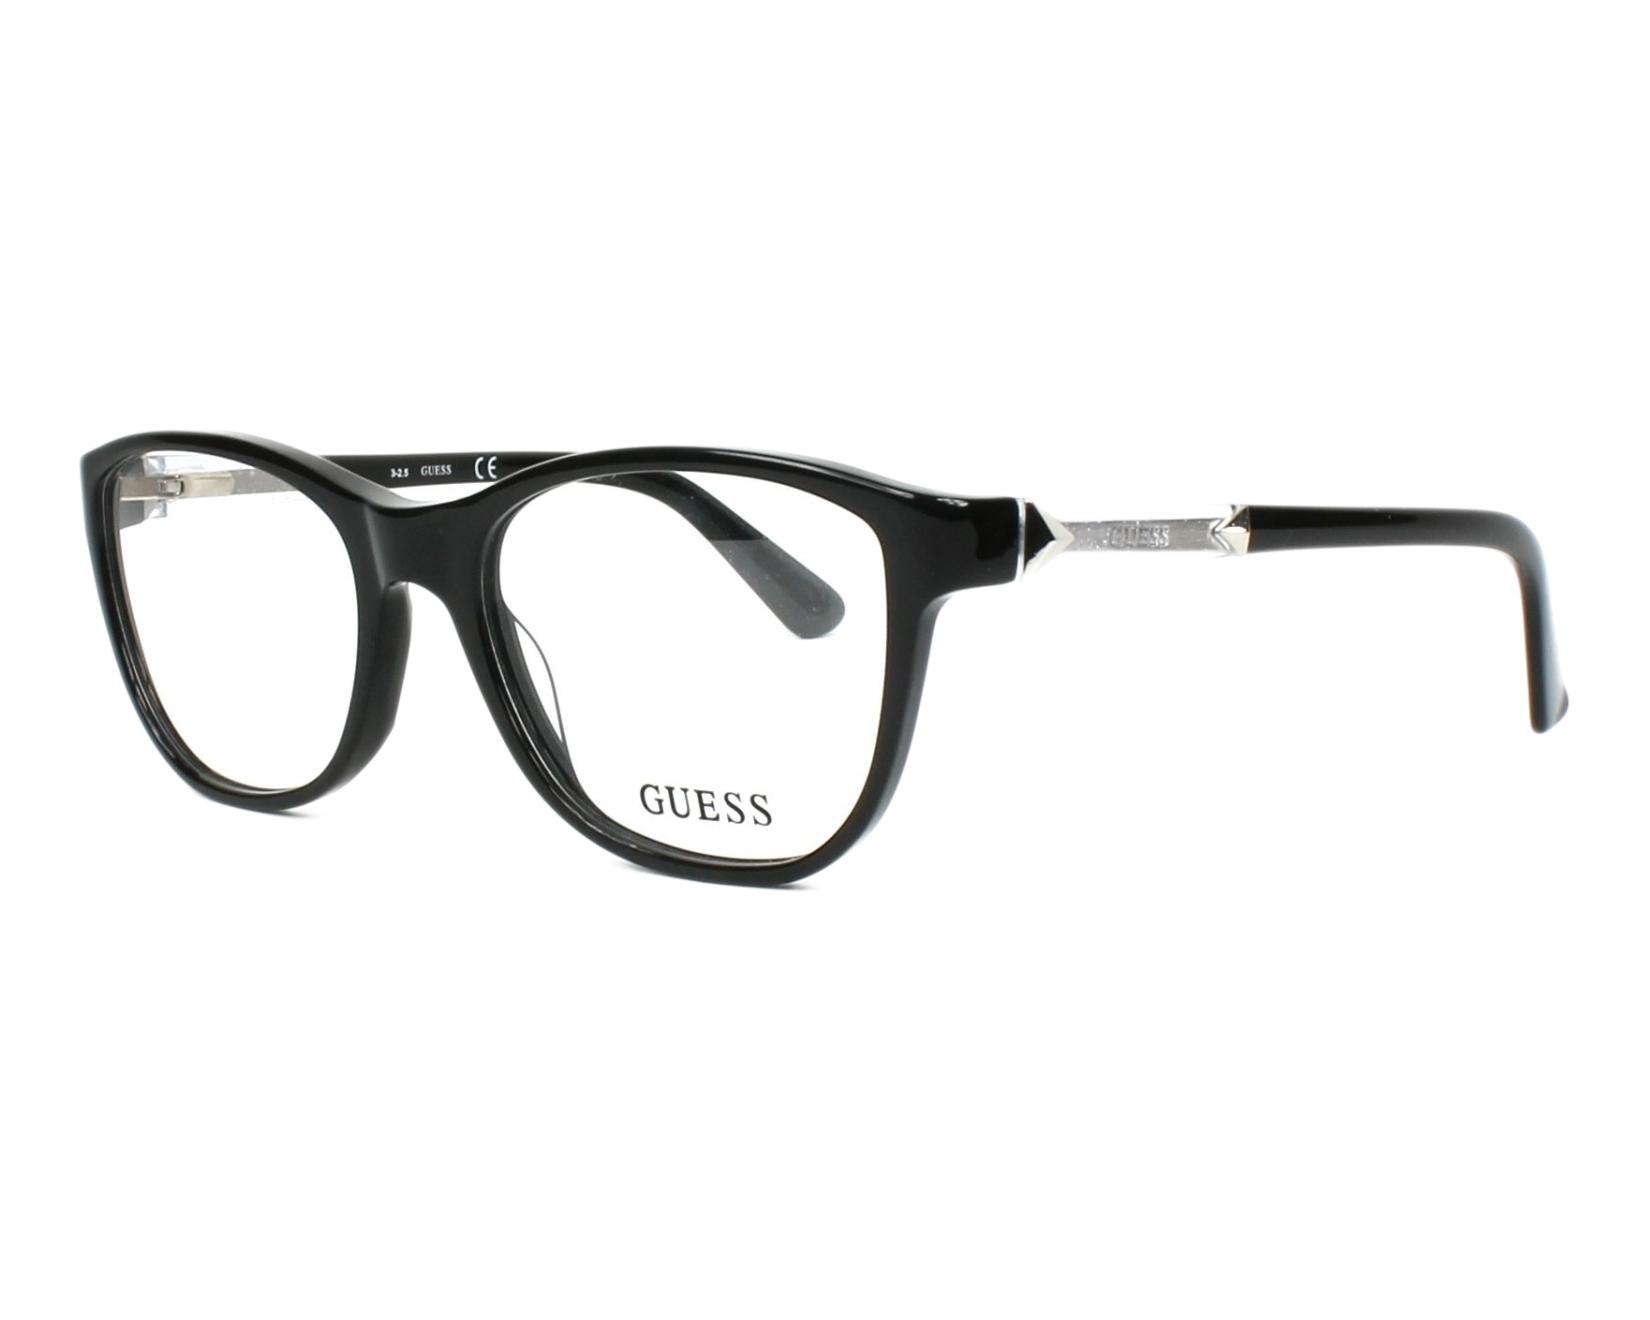 Guess Eyeglasses GU-2562 001 Black | visio-net.co.uk